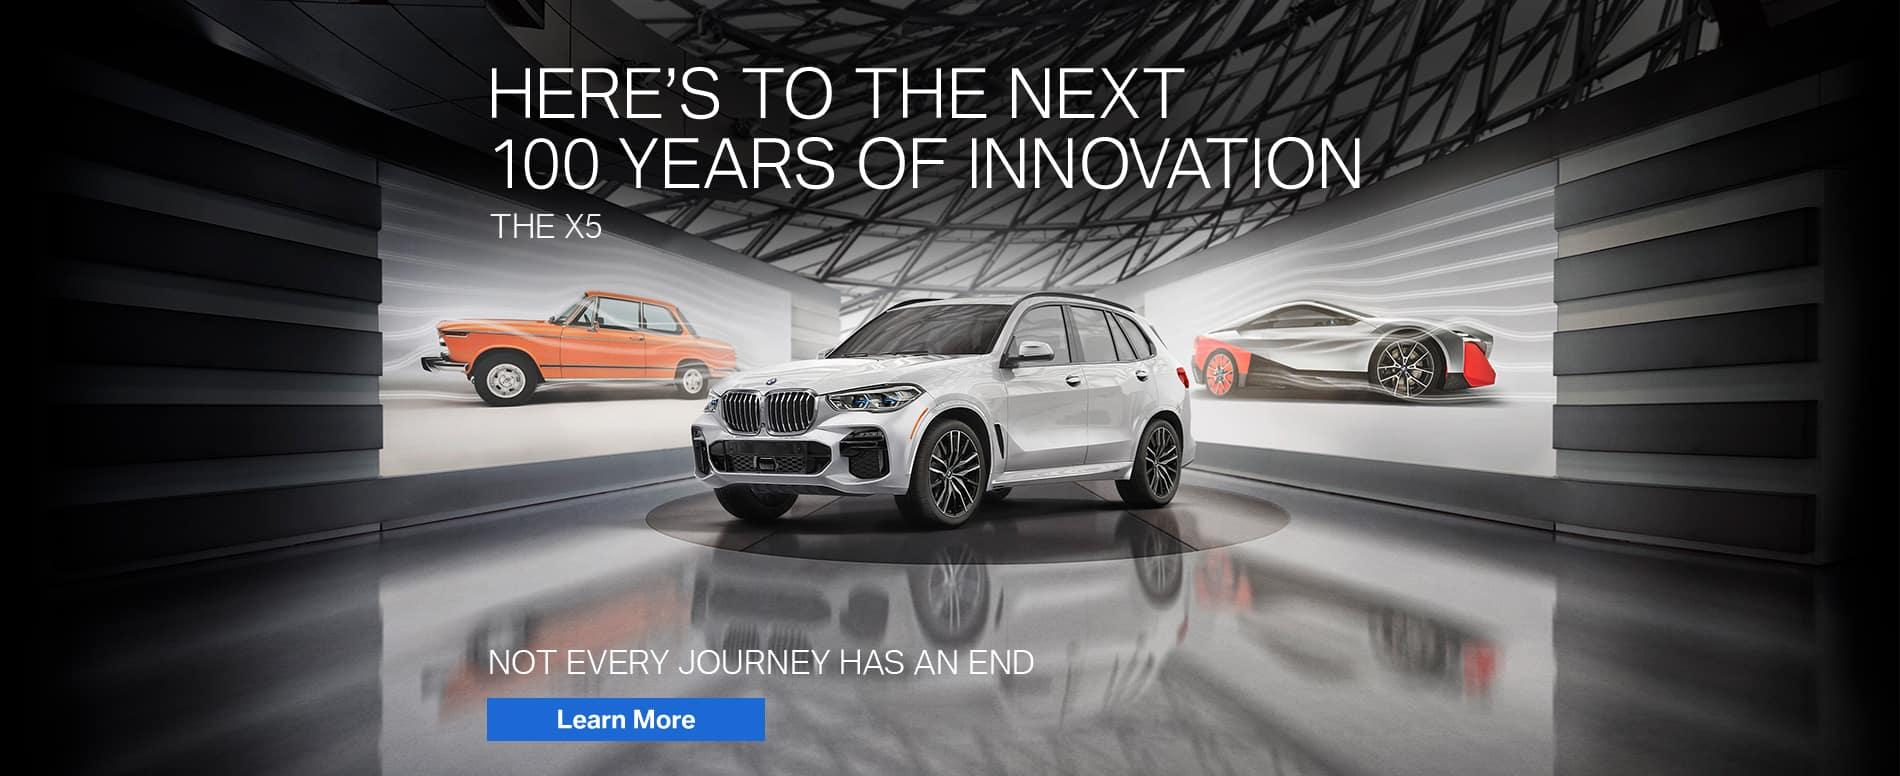 FMA1_OCT_PUSH_BMW_X5_Innovation